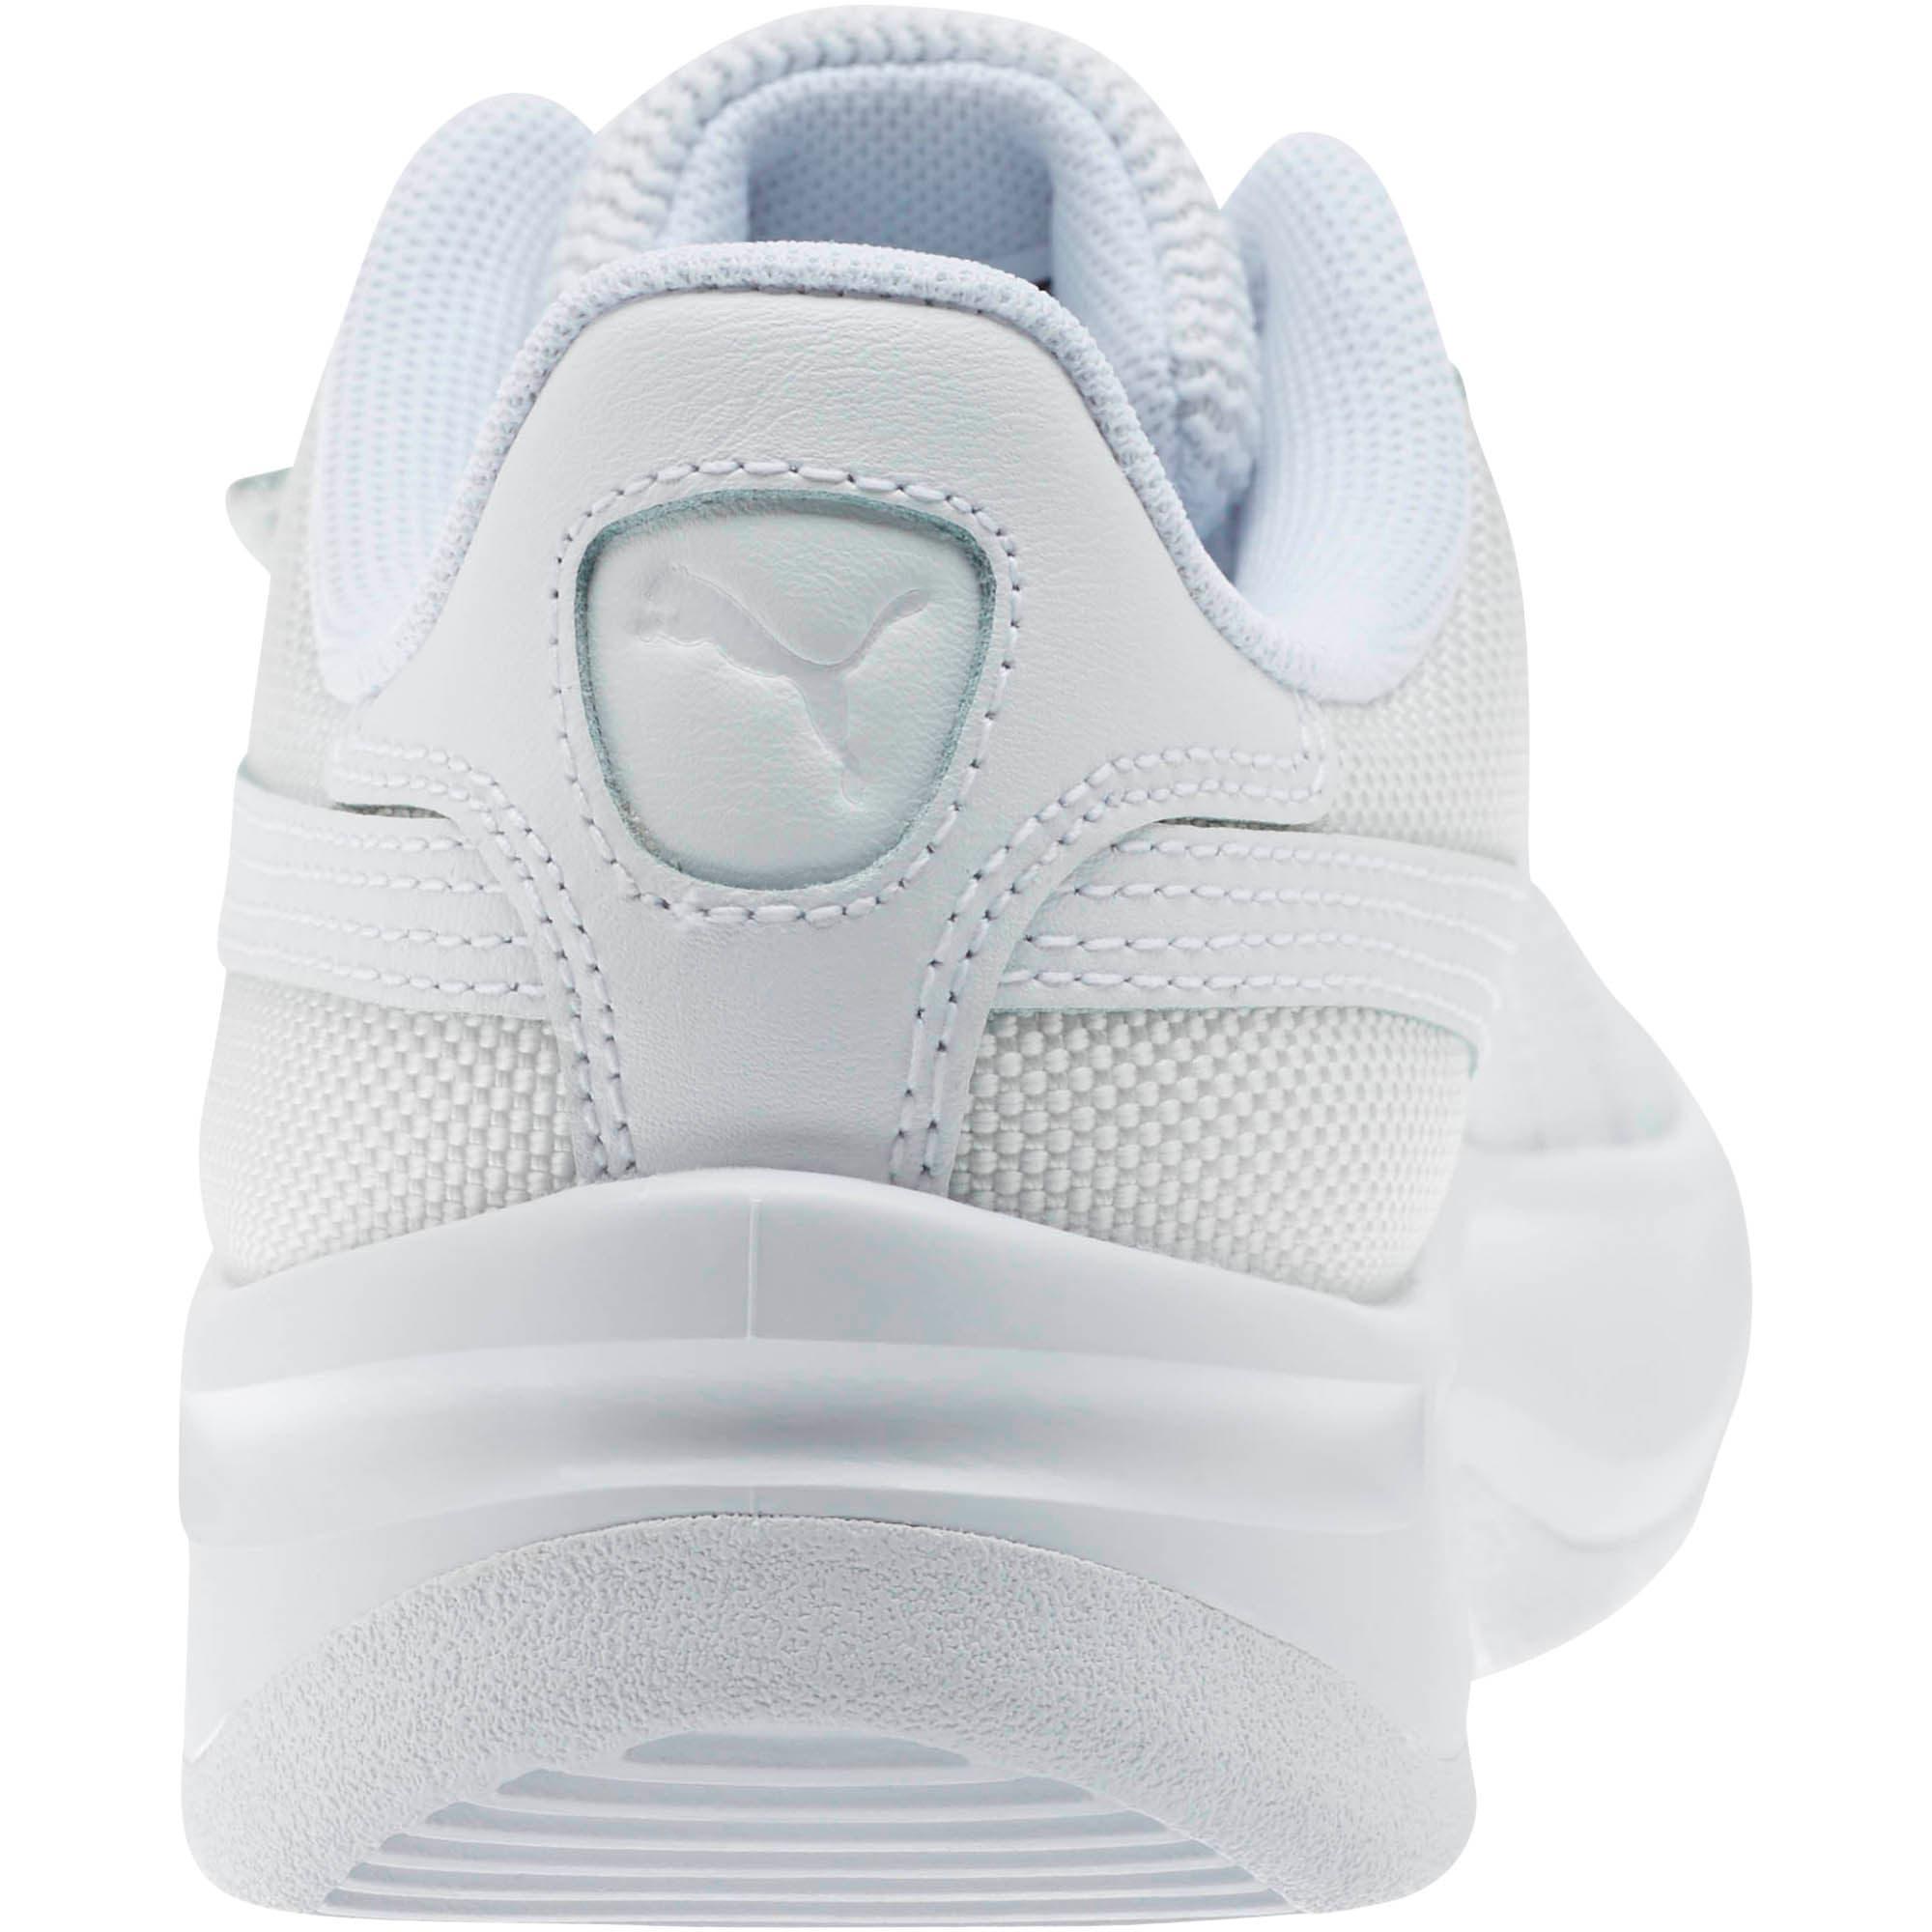 Thumbnail 3 of California Sneakers JR, P White-P White-P White, medium